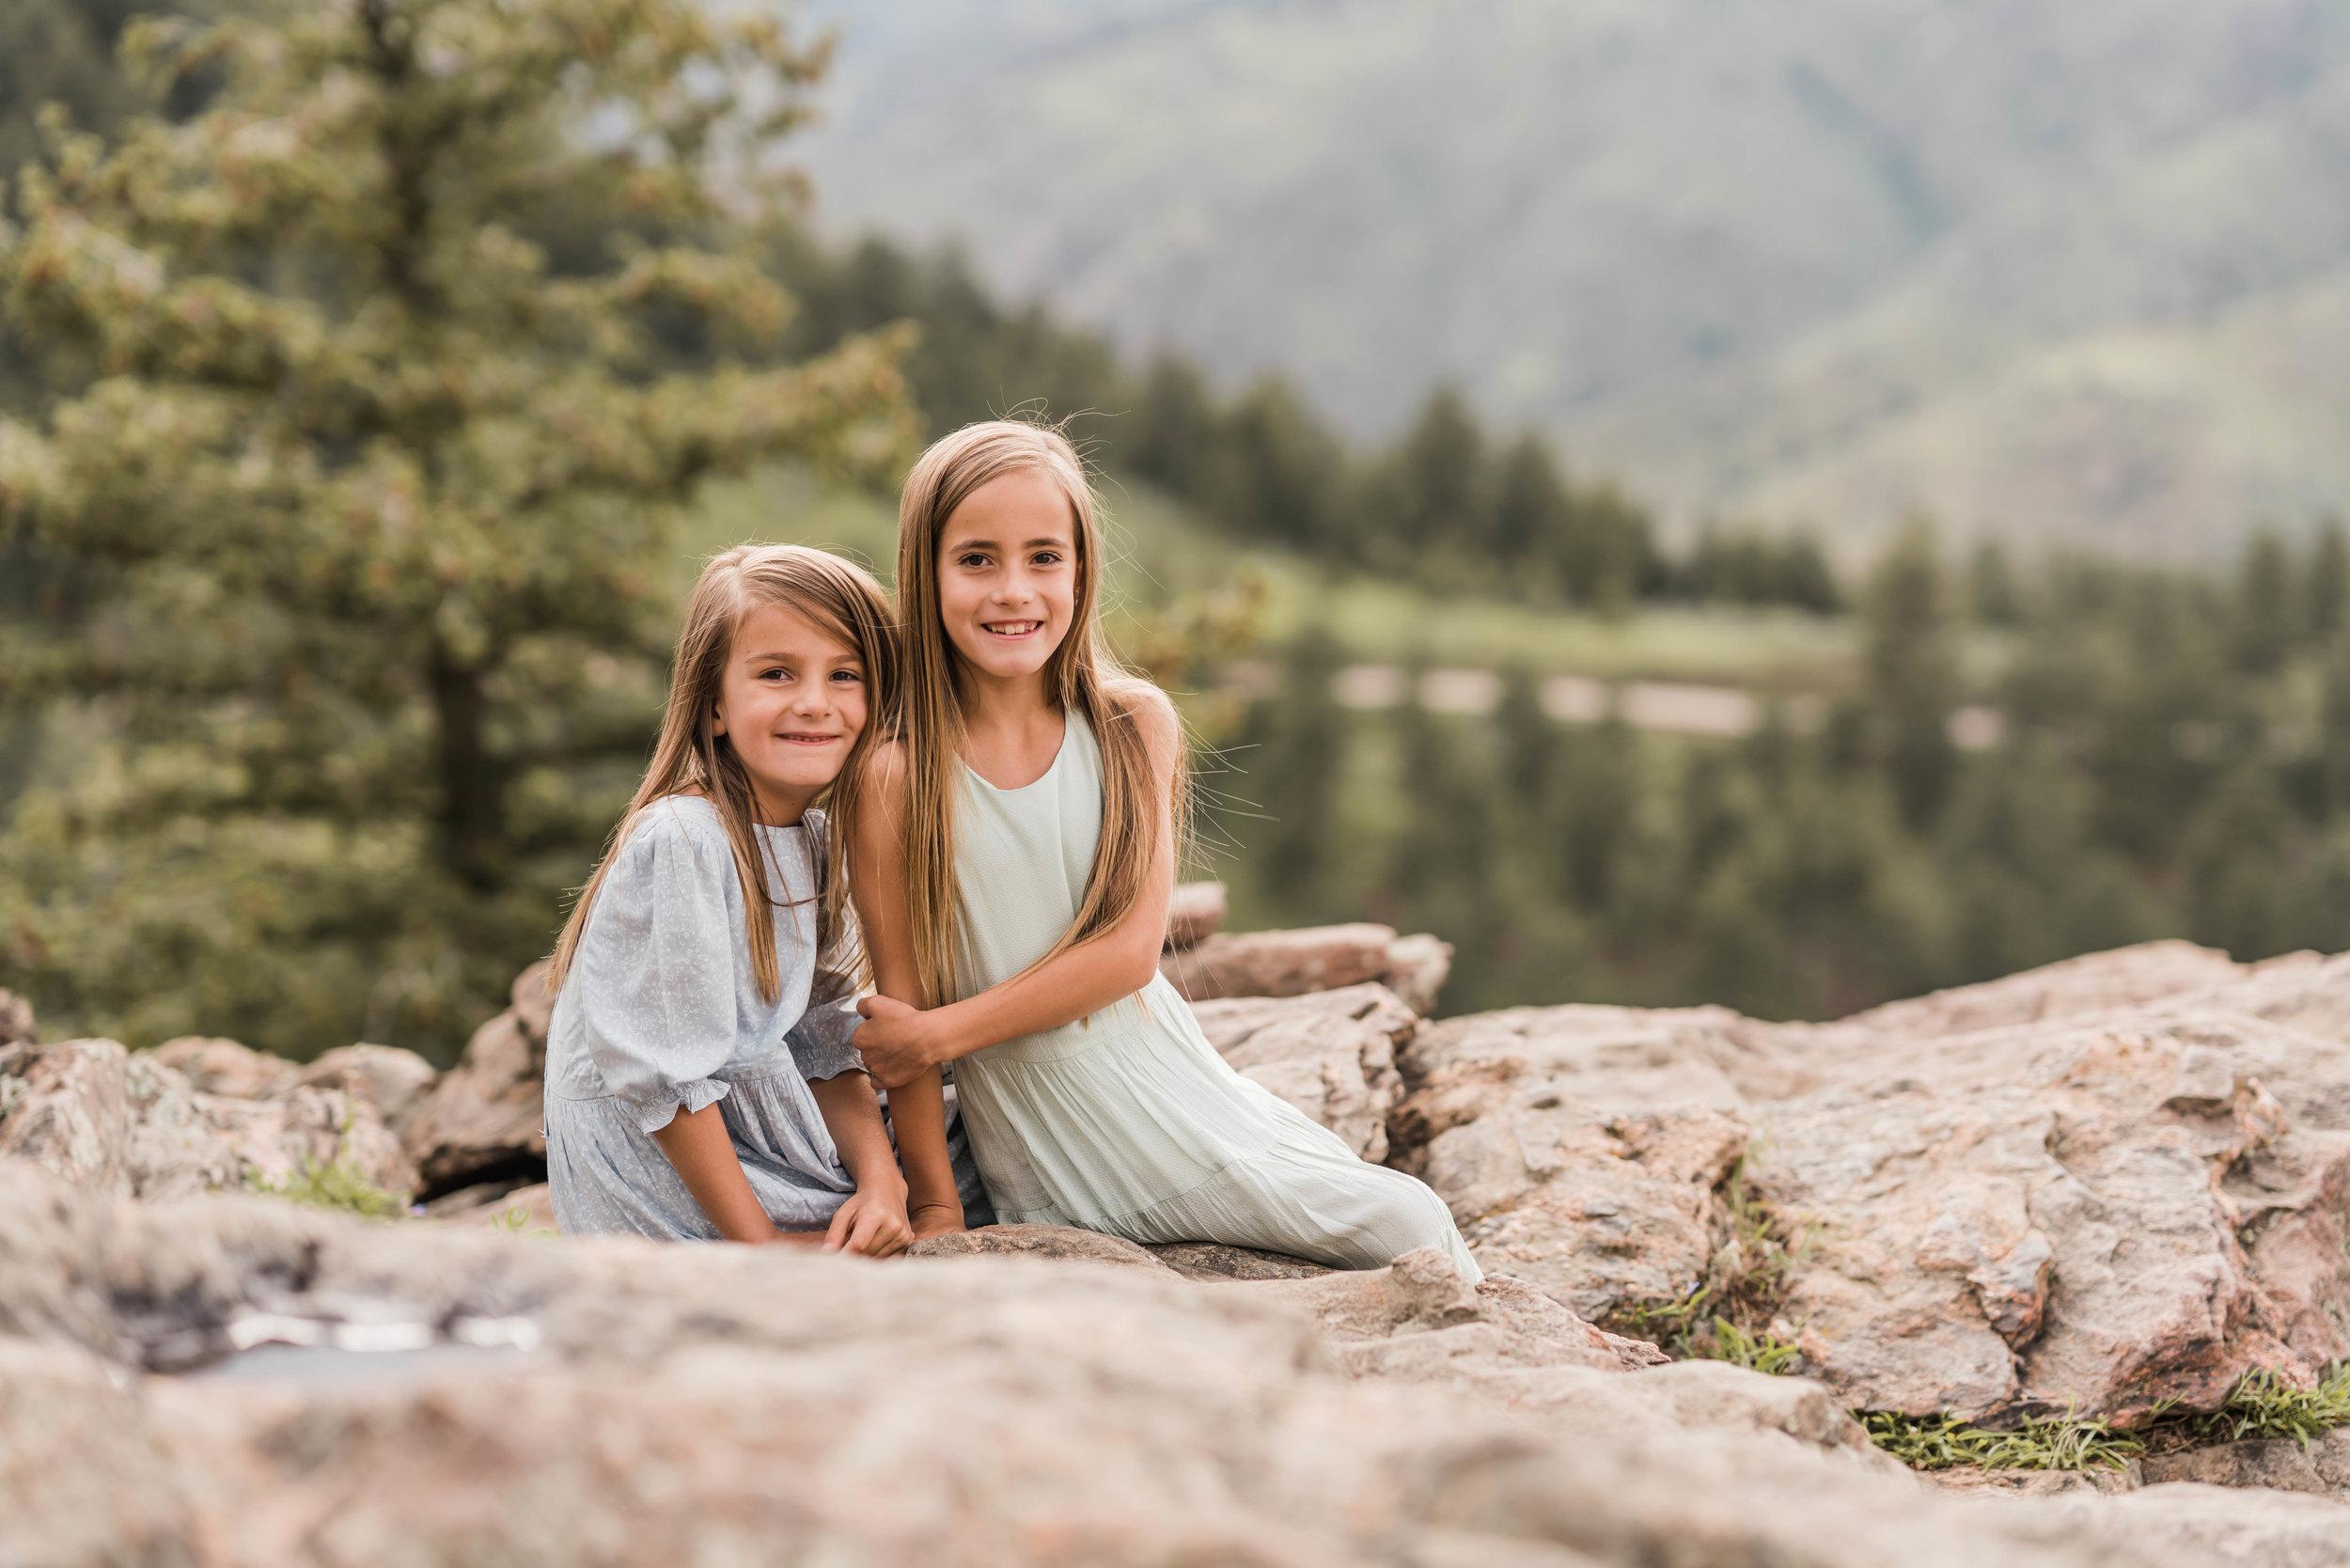 denver family photographer at lookout mountain -DSC07050.jpg